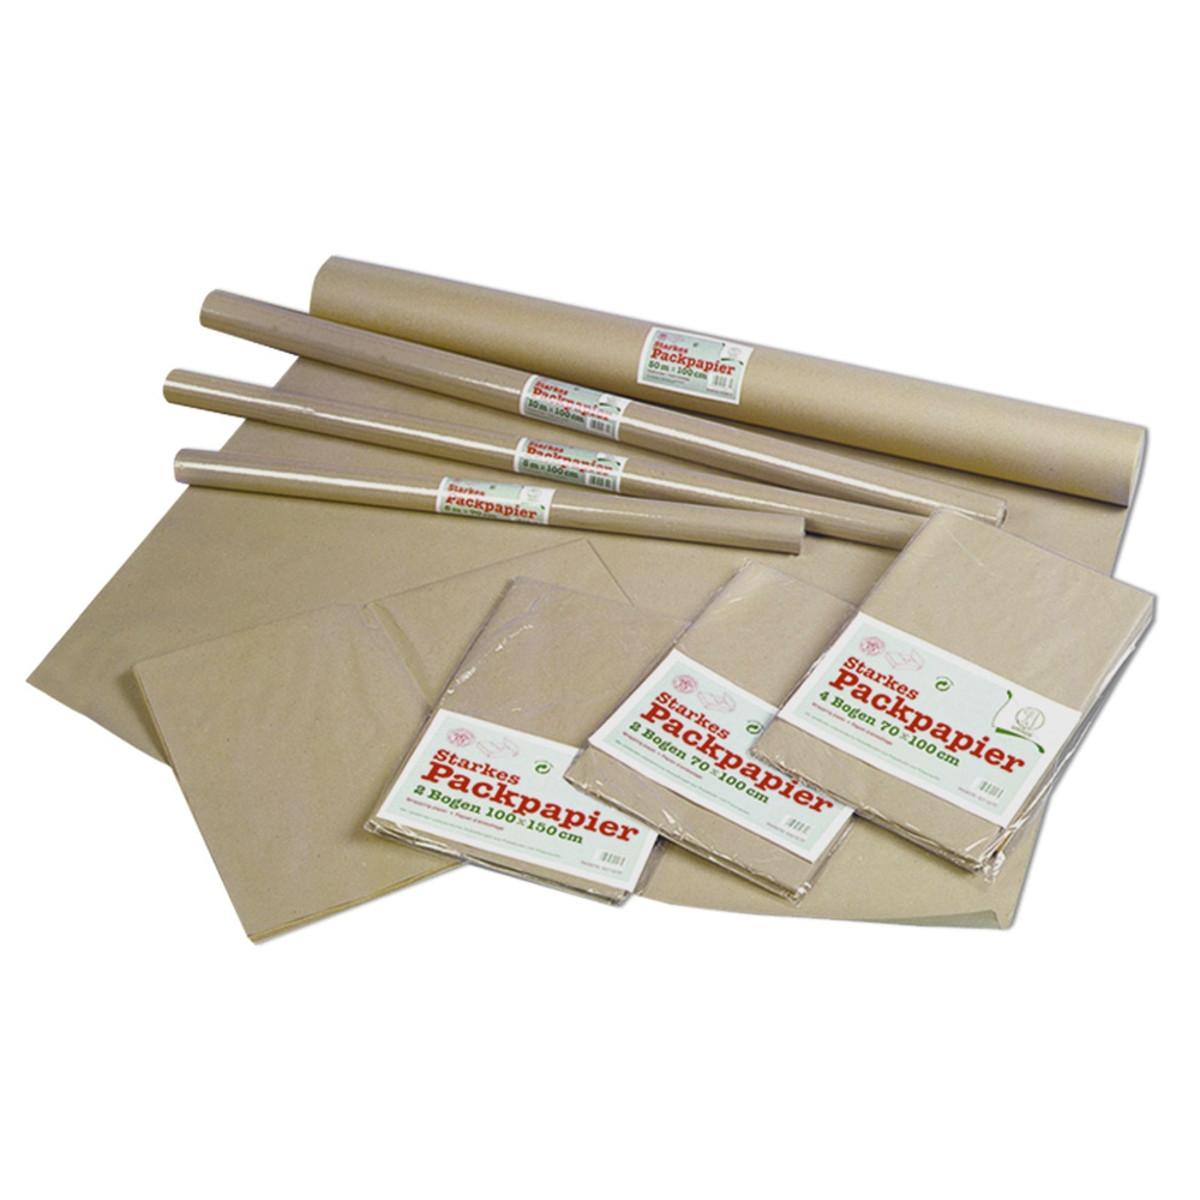 Packpapier 85 g/qm 70 x 100 cm - 2 Bogen